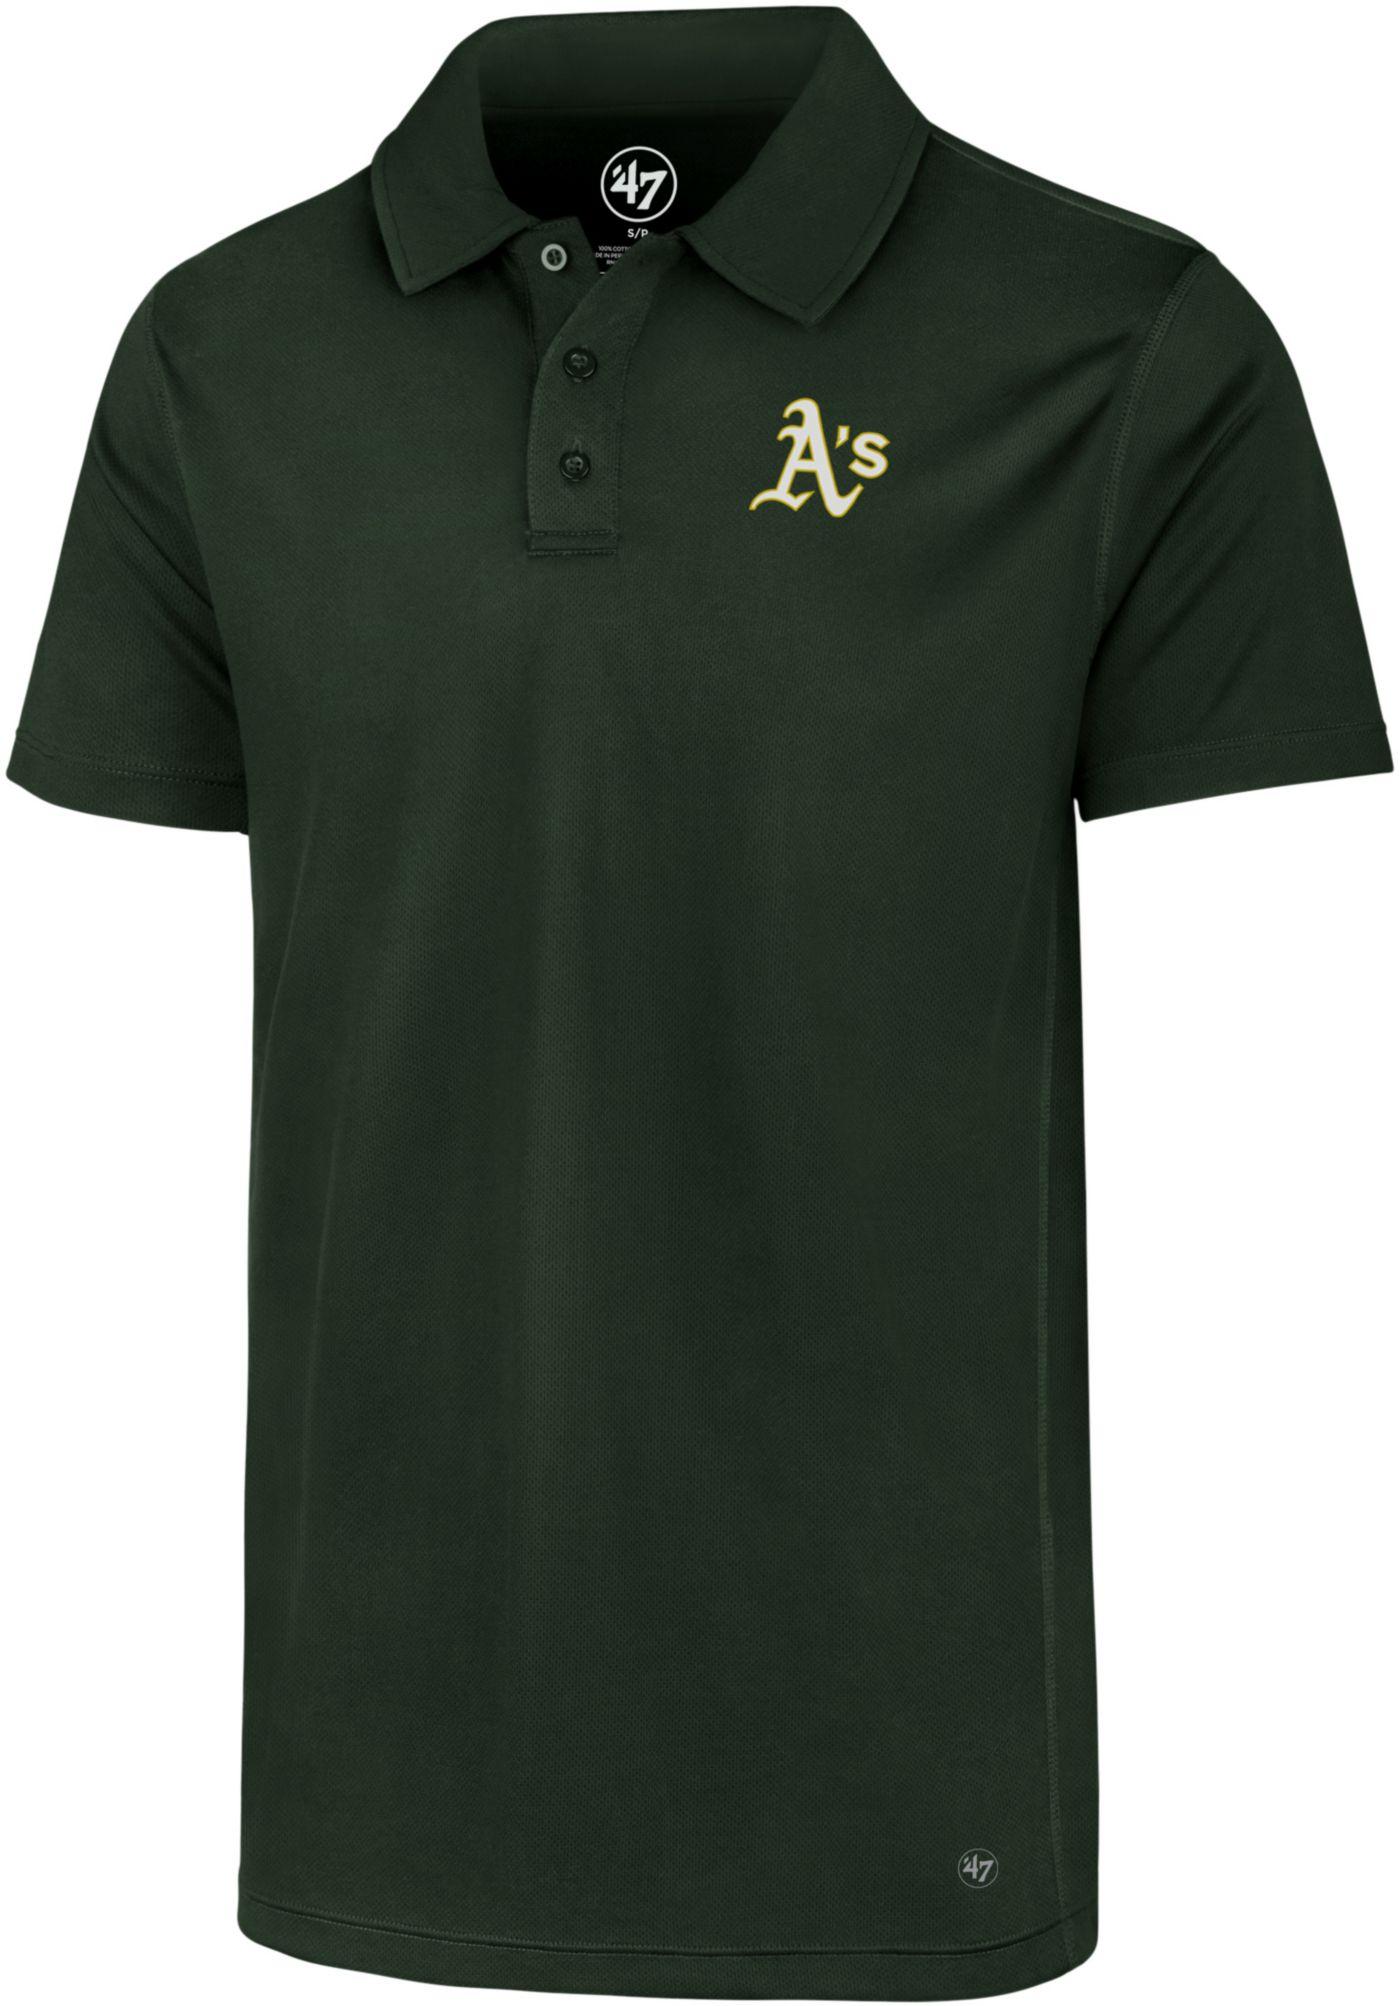 '47 Men's Oakland Athletics Ace Performance Polo